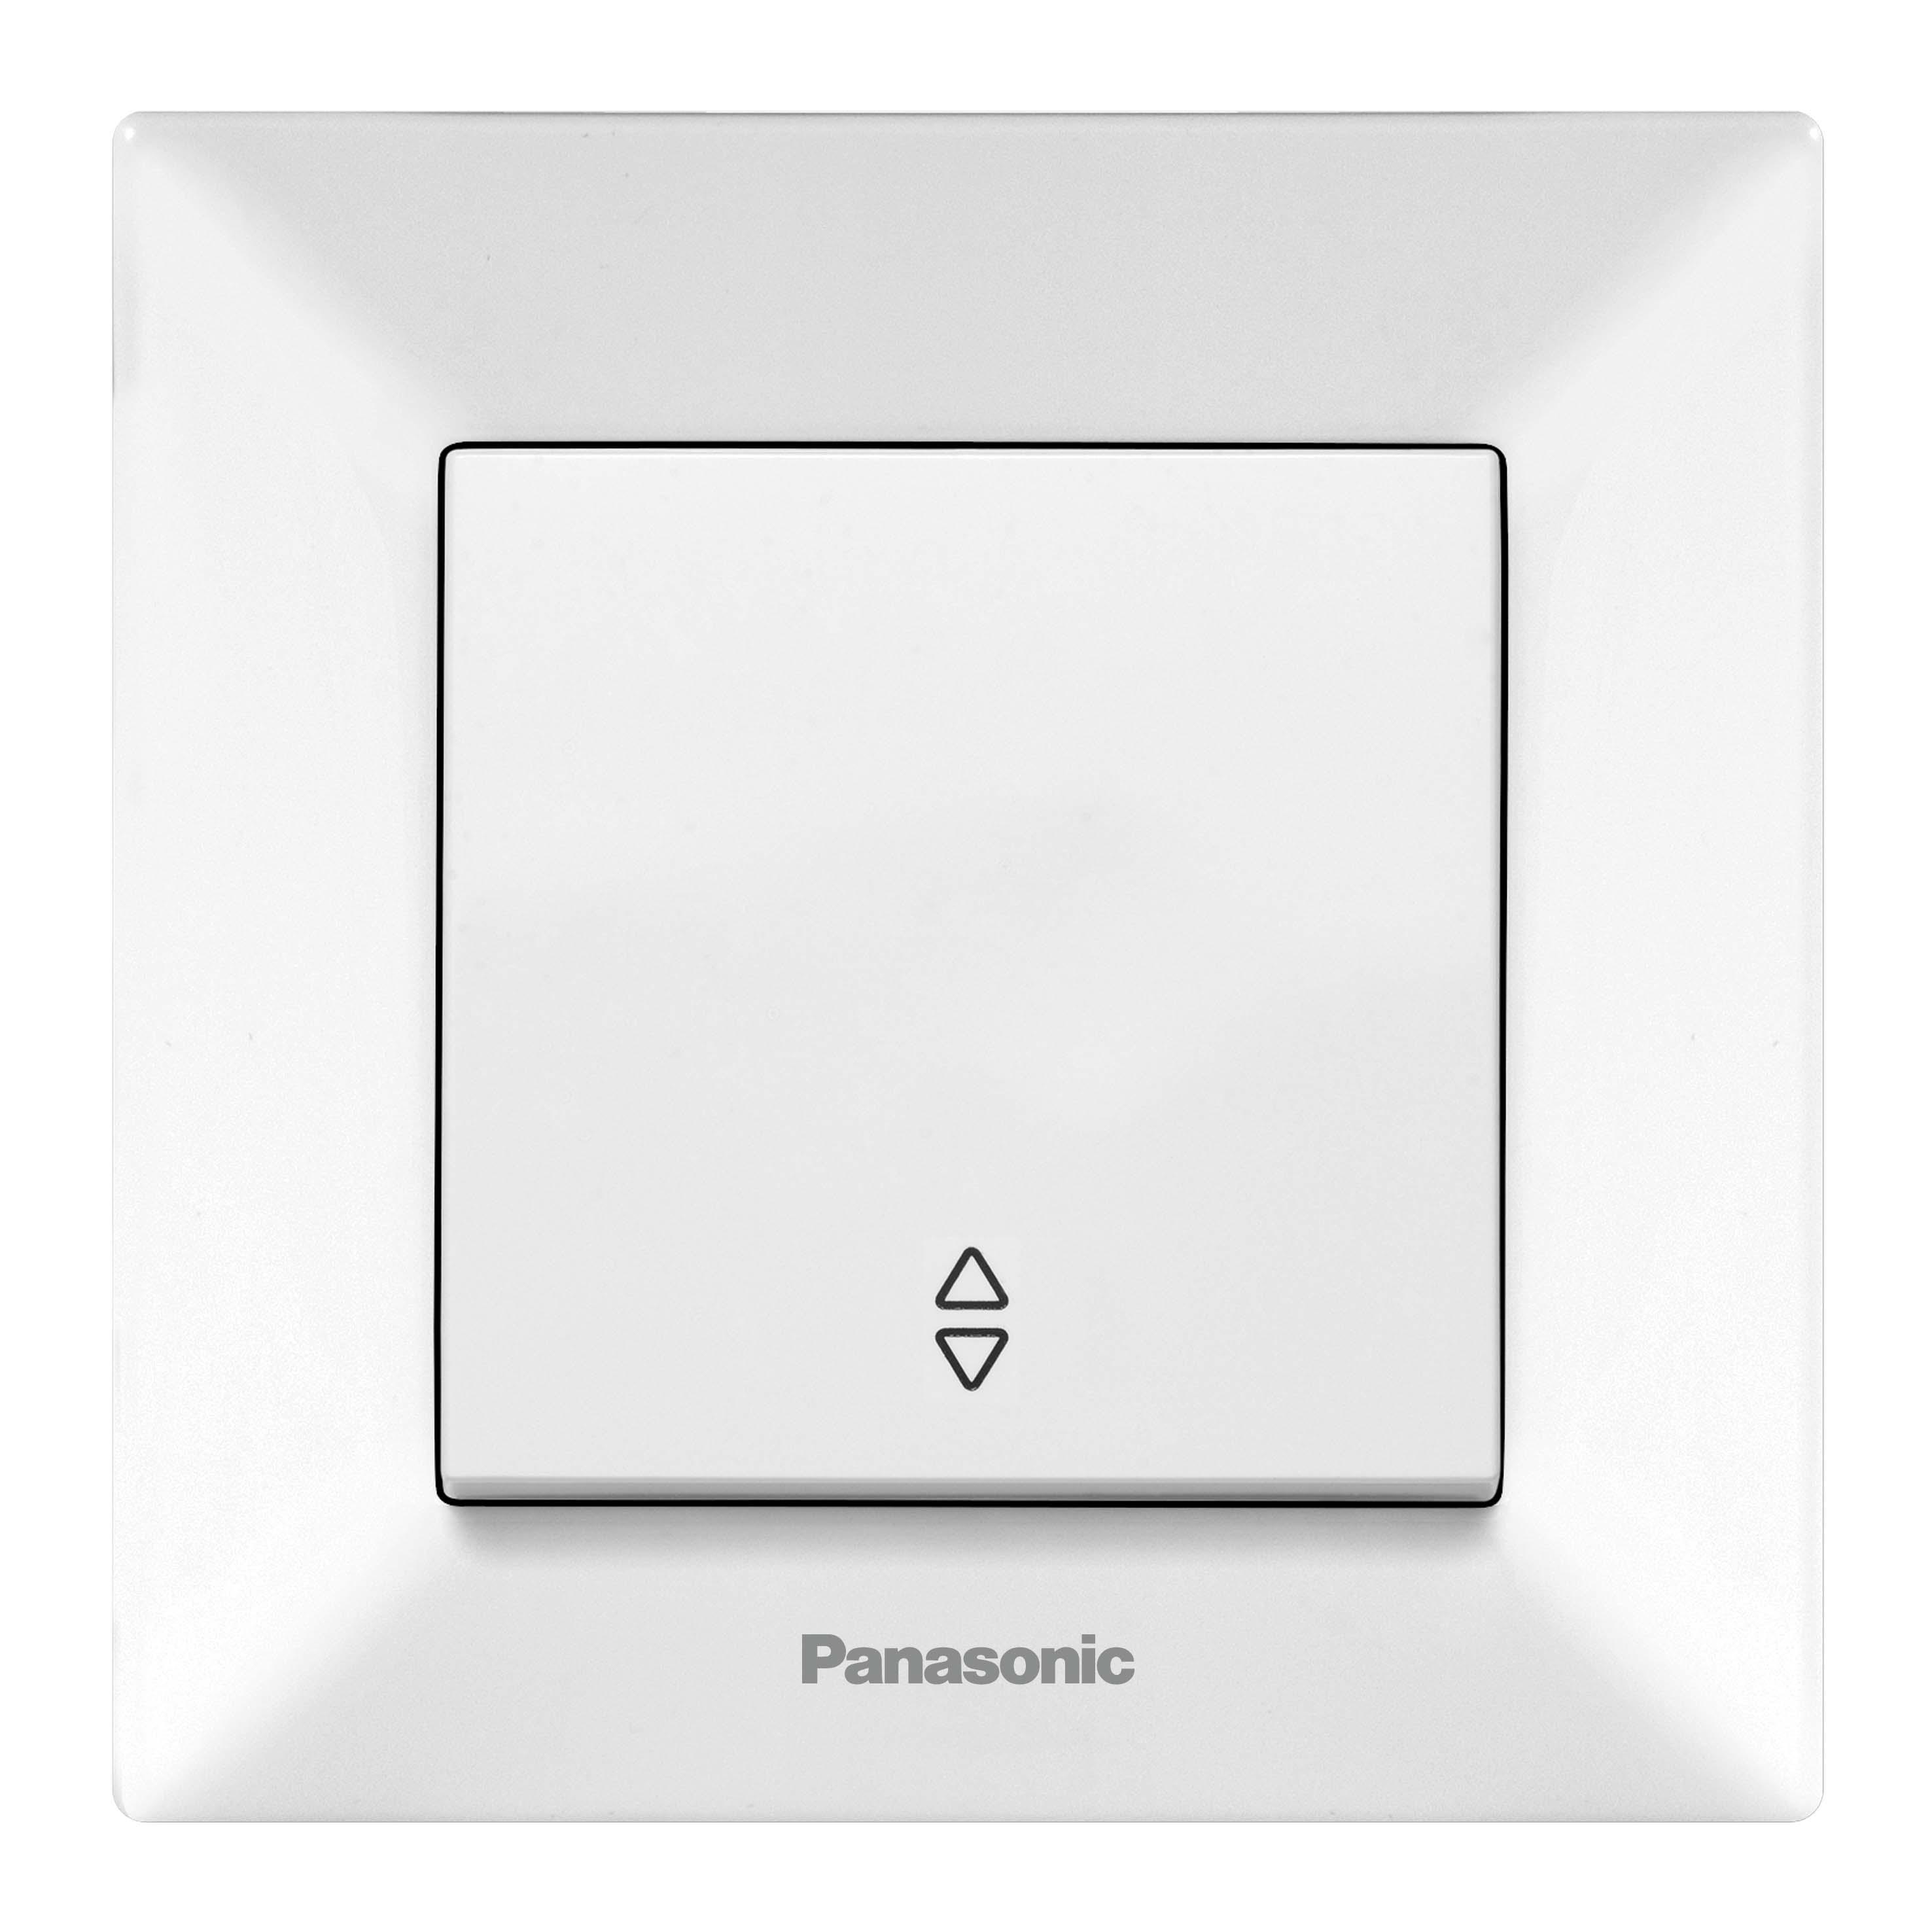 Переключатель Panasonic Wmtc0003-2wh-res arkedia